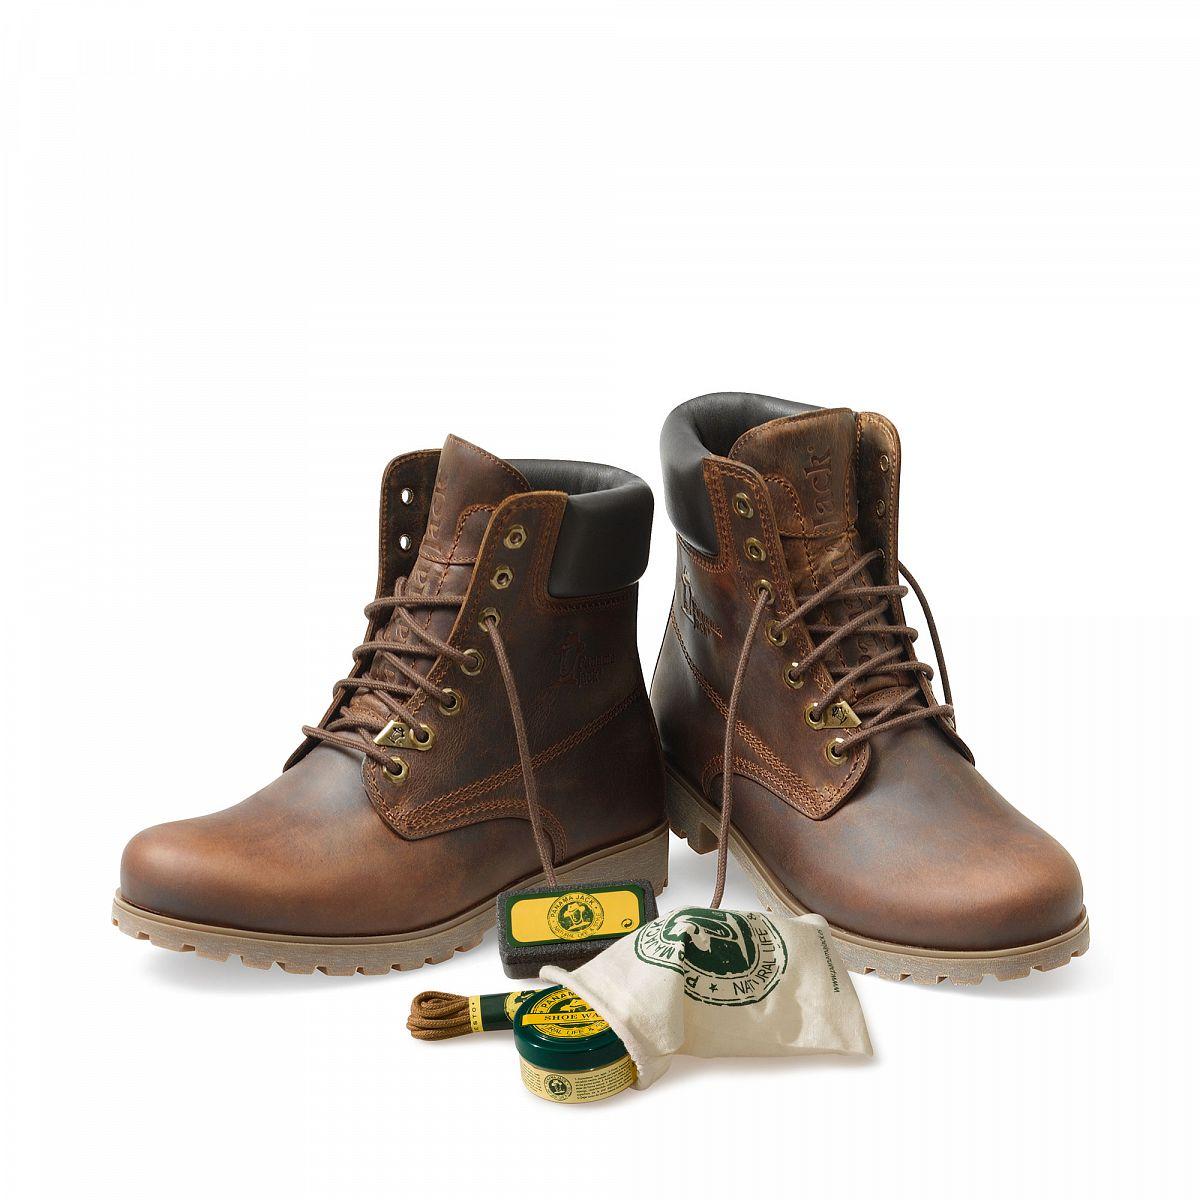 men 39 s boots panama 03 bark panama jack official store. Black Bedroom Furniture Sets. Home Design Ideas